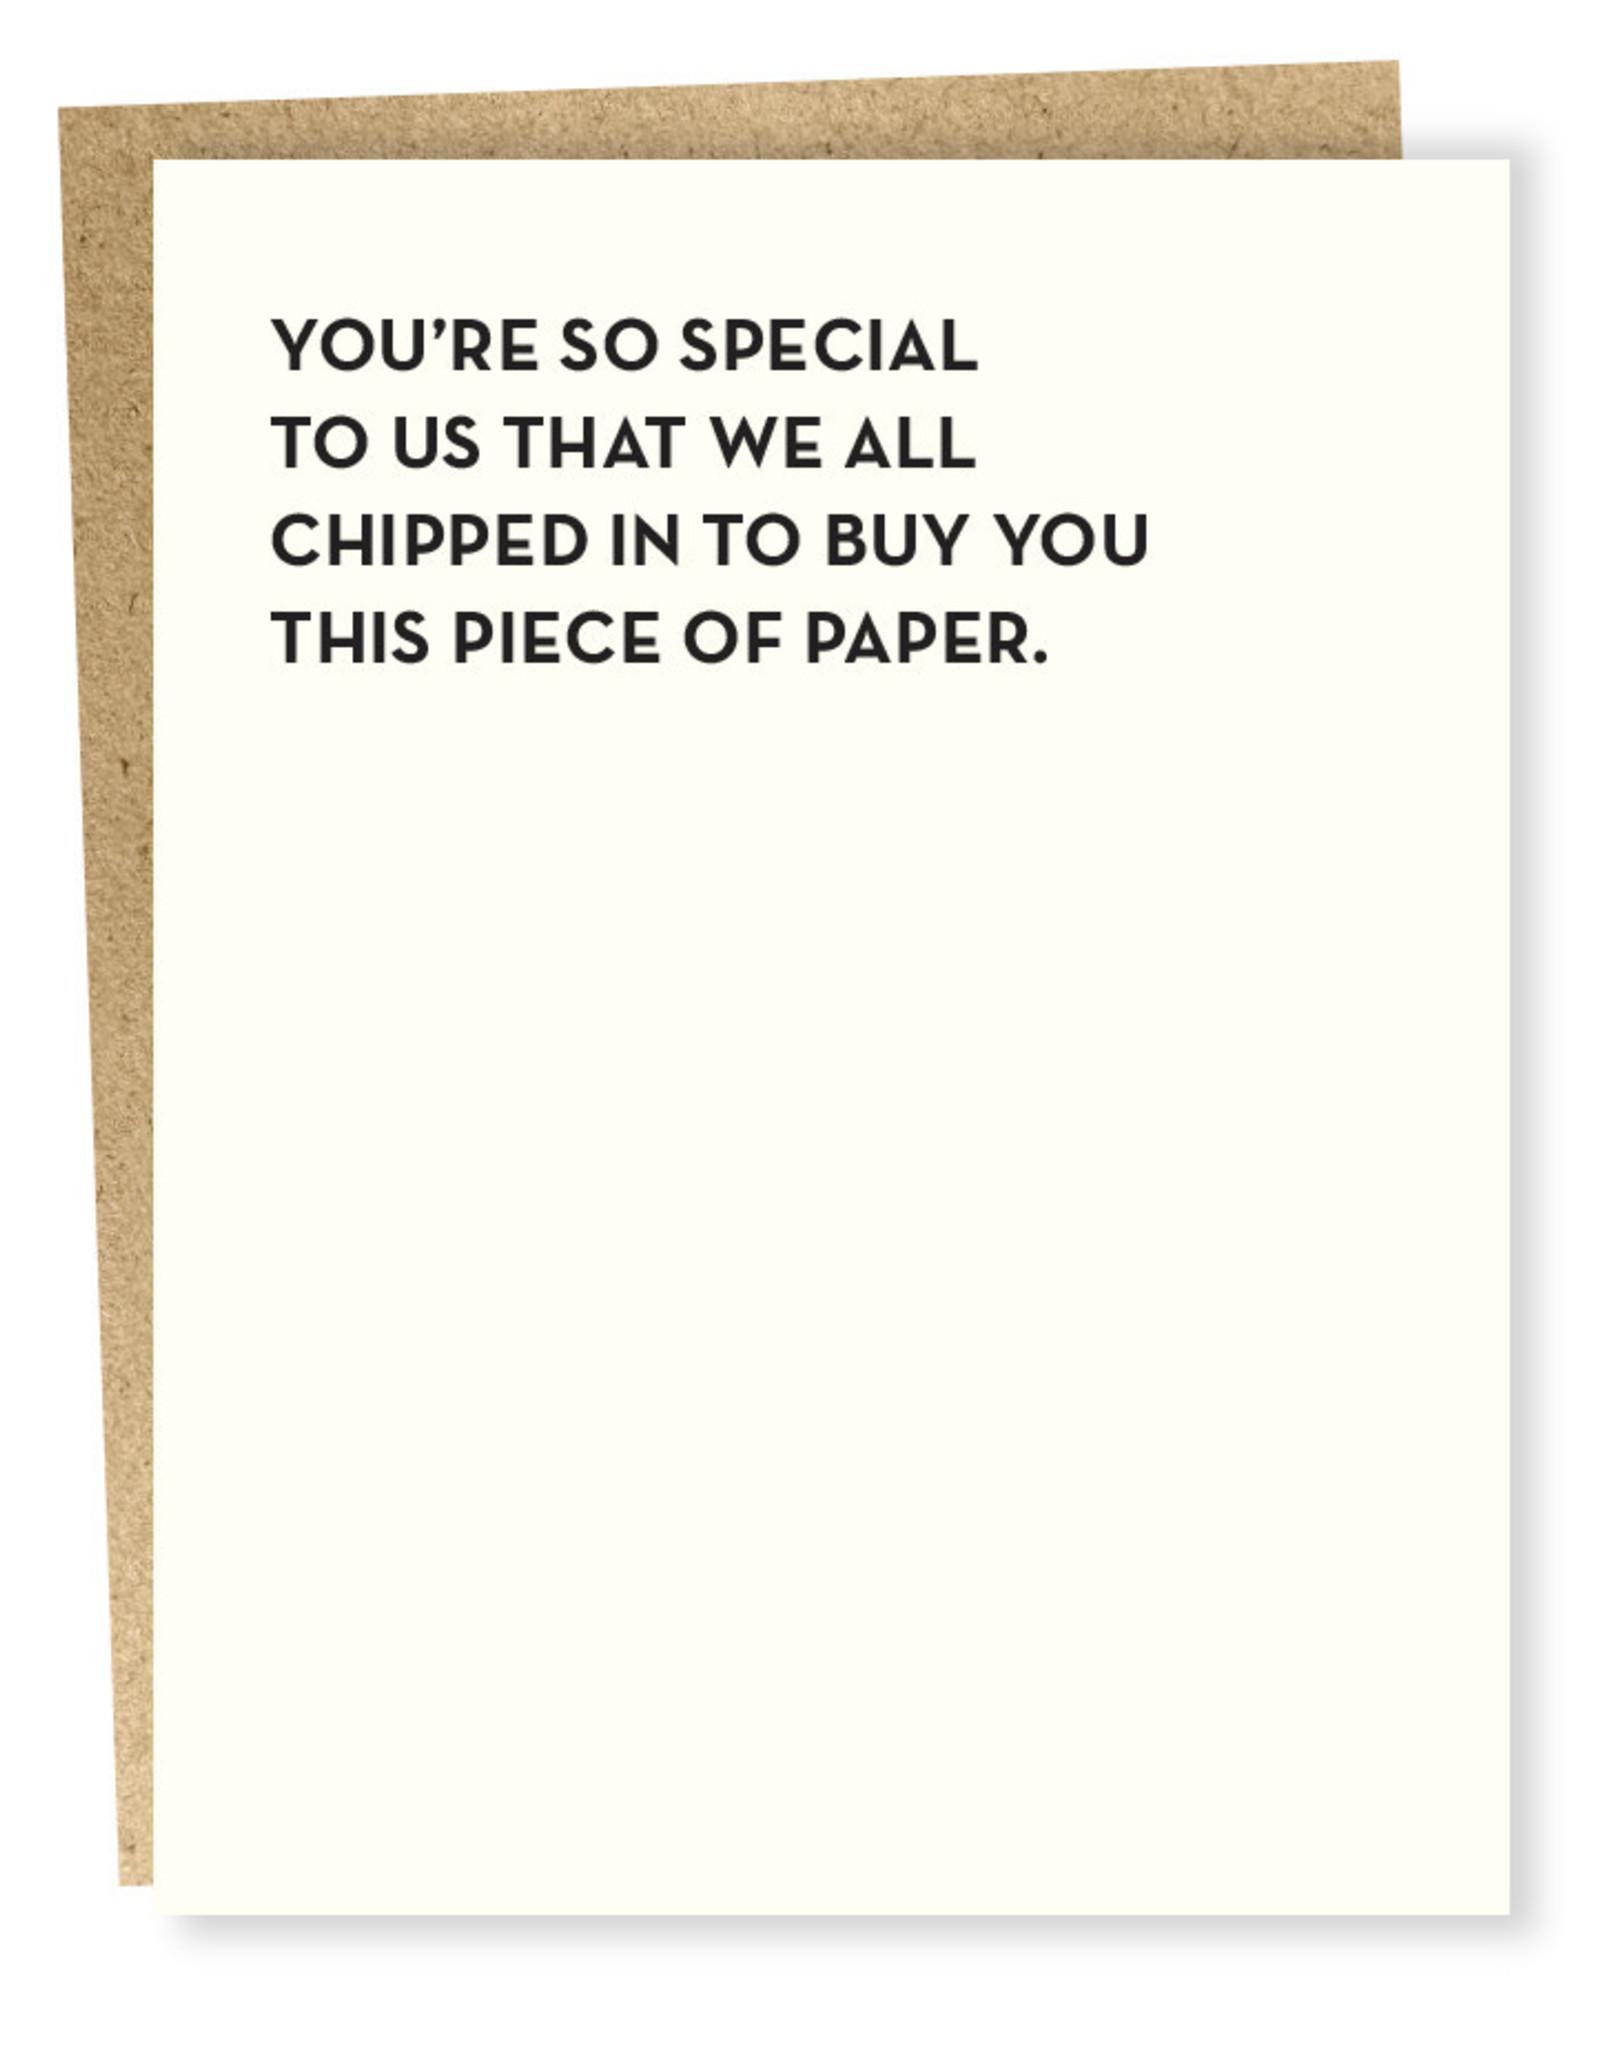 Sap-P So Special Card